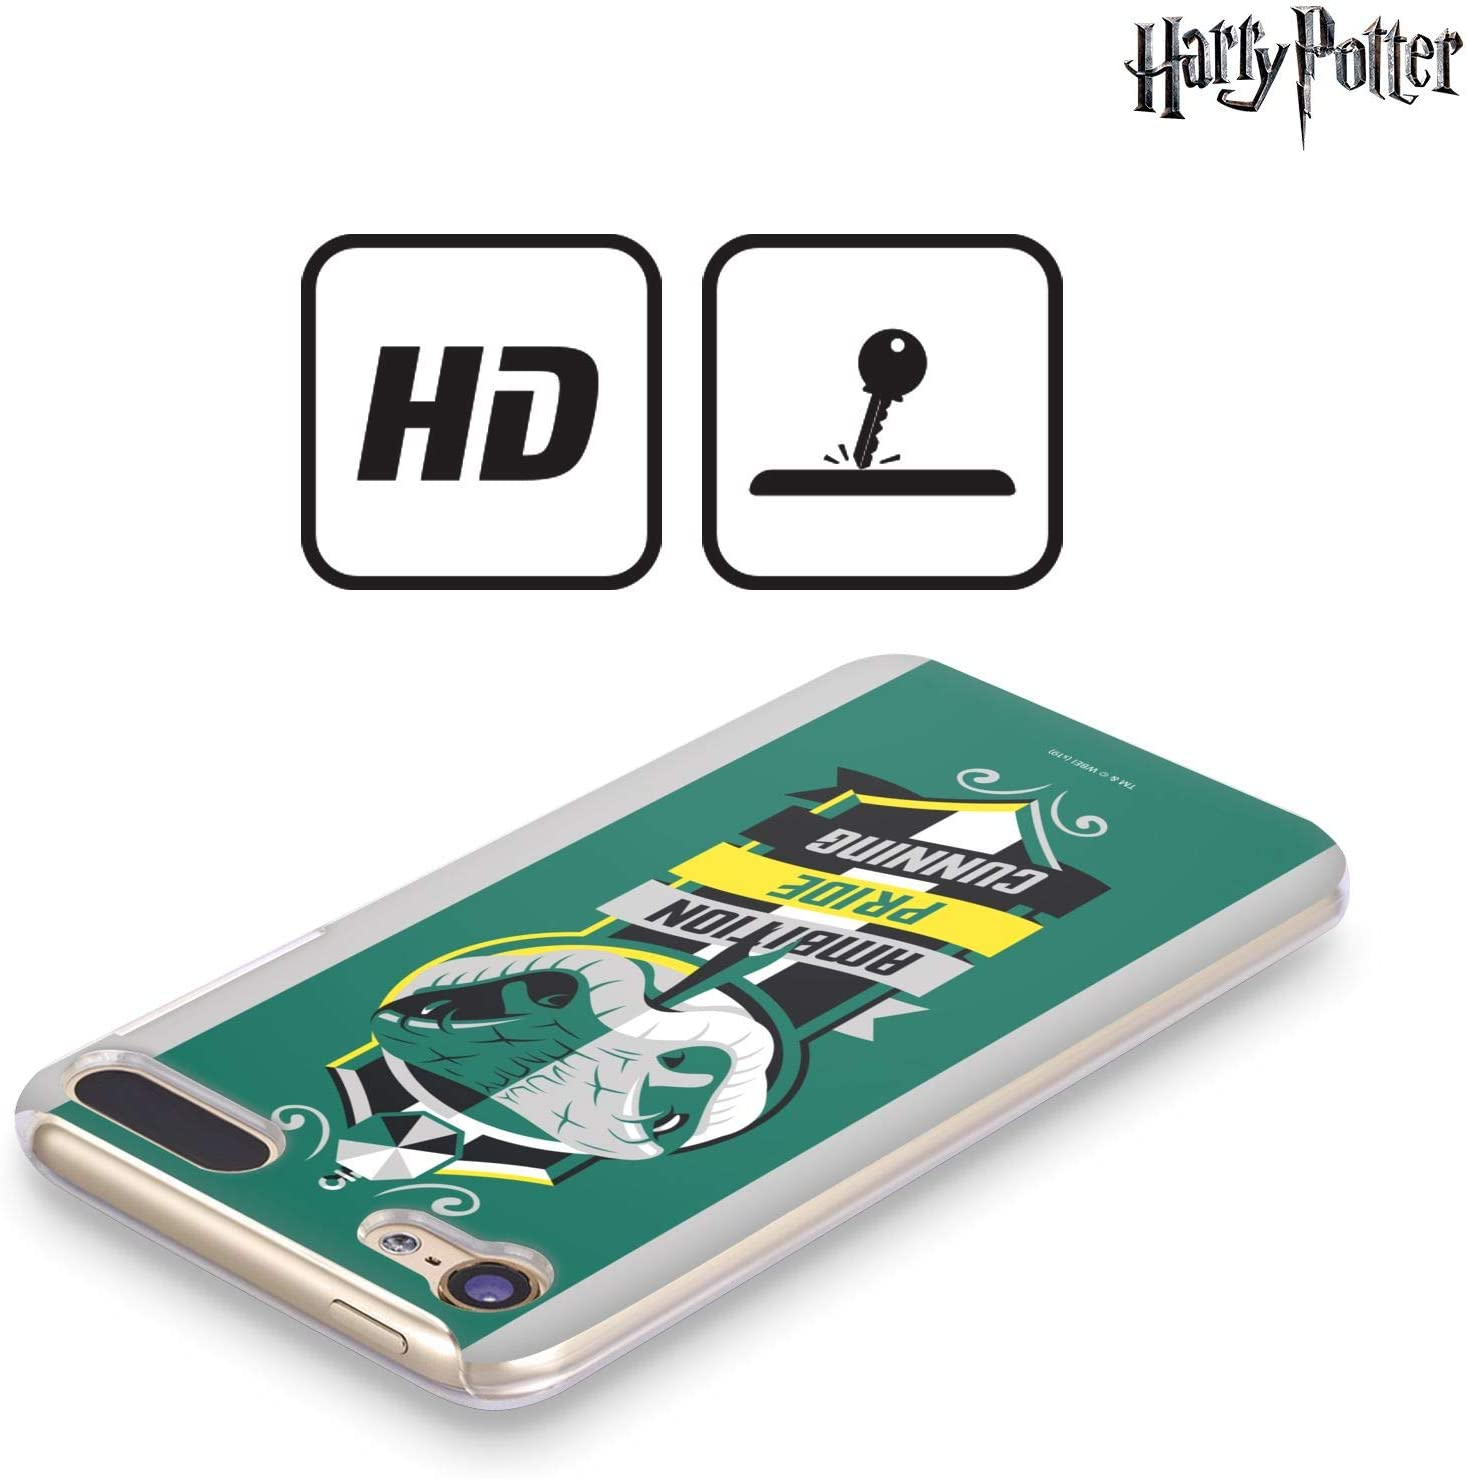 Head Case Designs Oficial Harry Potter Slytherin Deathly Hallows Vi Carcasa r/ígida Compatible con iPod Touch 5G 5th Gen